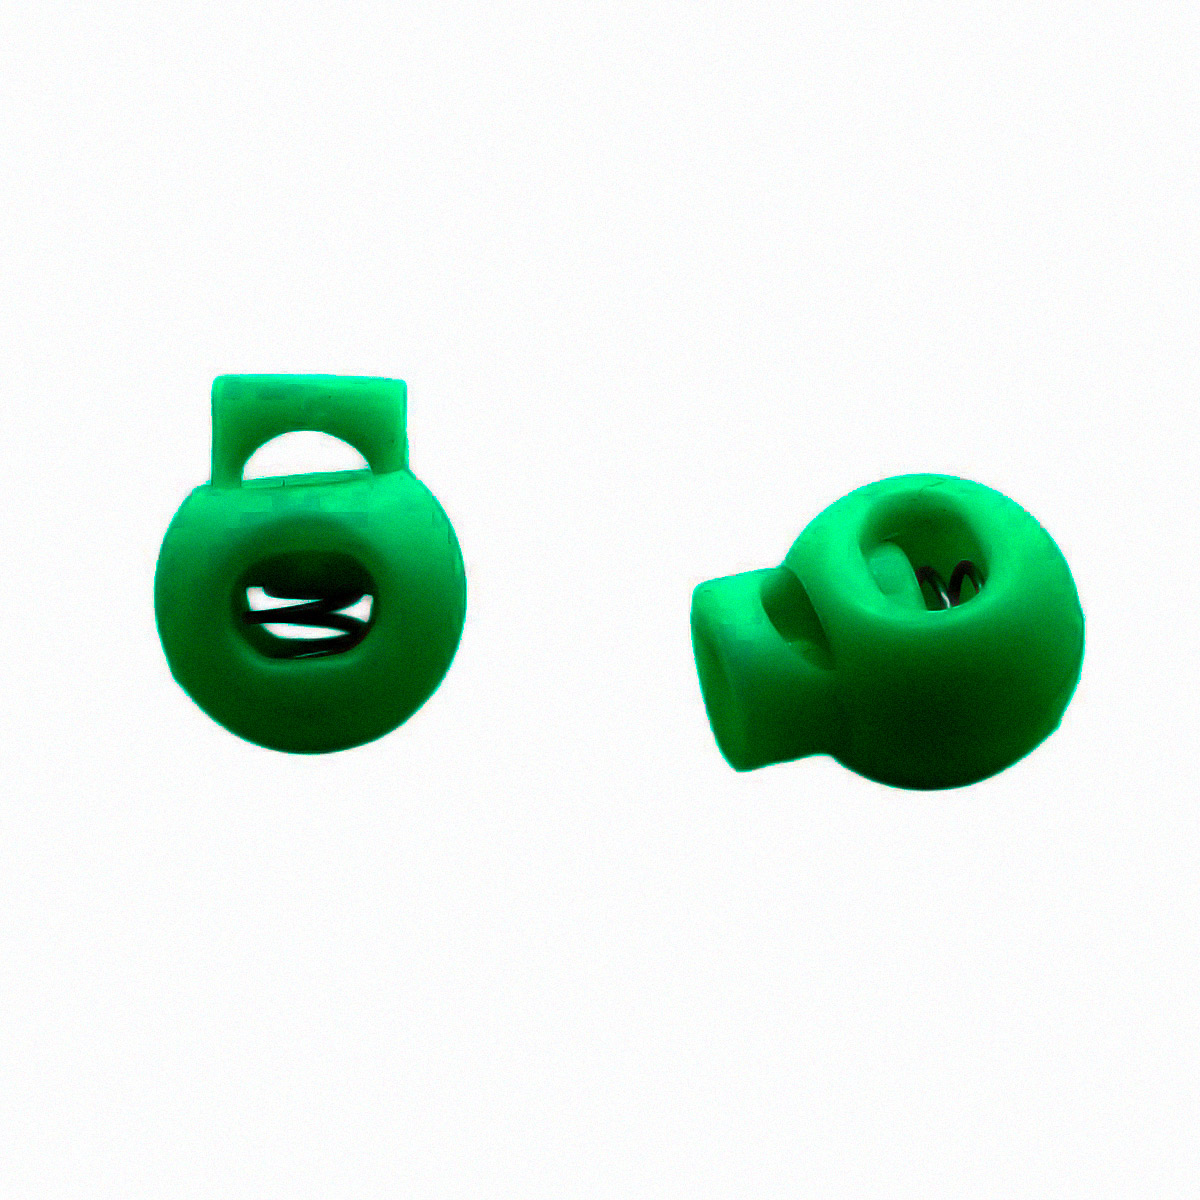 0305-3129 Стопор 'Шар' d=7мм, 17мм, пластик (С890 зеленый) фото